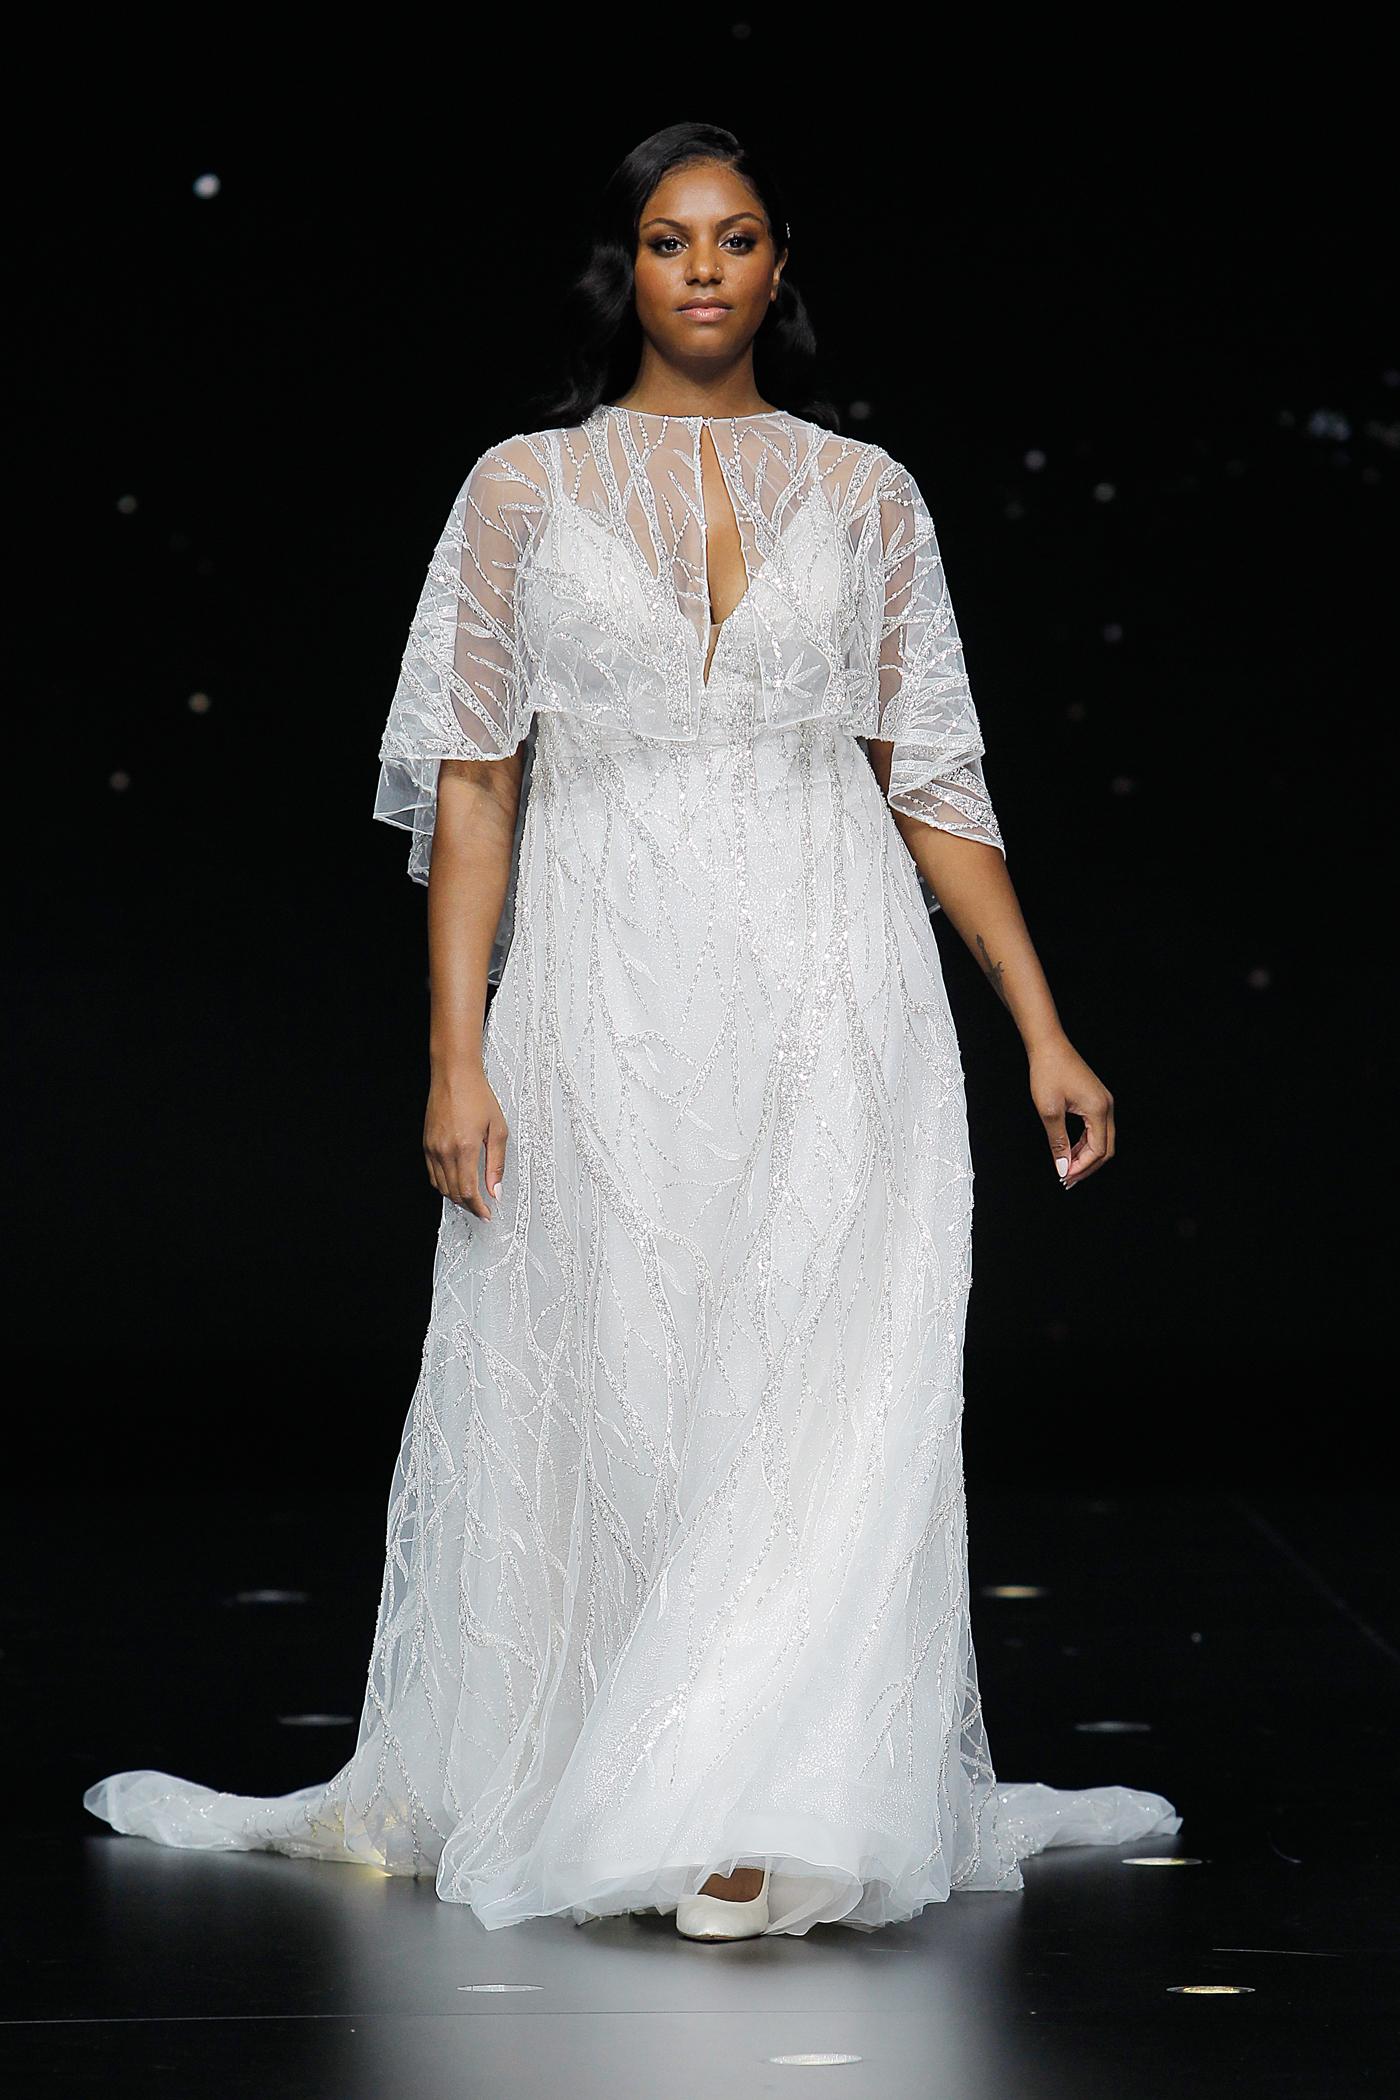 pronovias glittery spaghetti strap wedding dress with capelet spring 2020